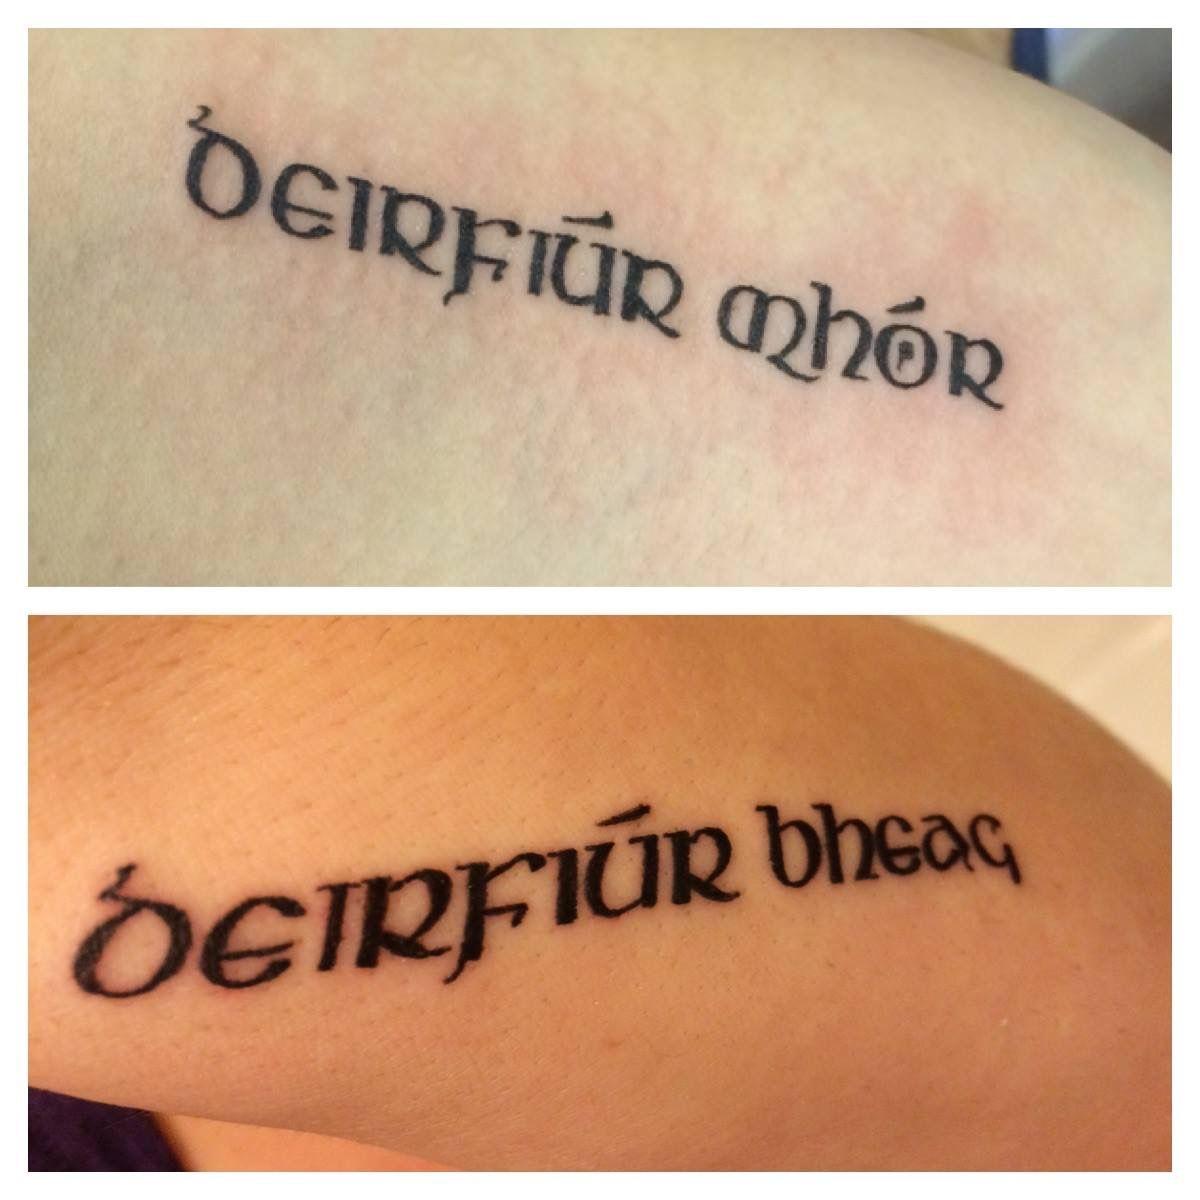 Big sister & little sister in Gaelic   Tattoos <3   Gaelic